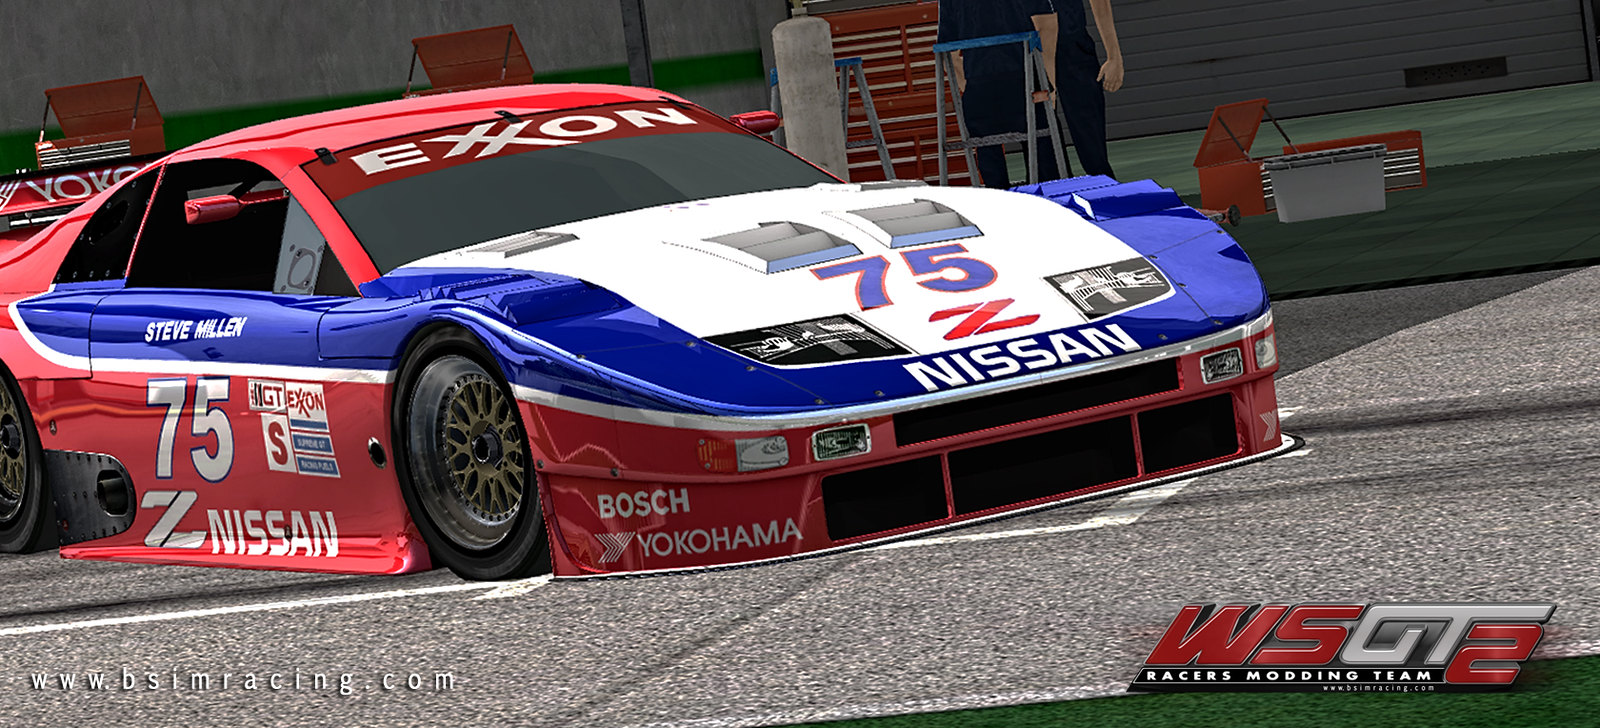 Nissan_Imsa_4